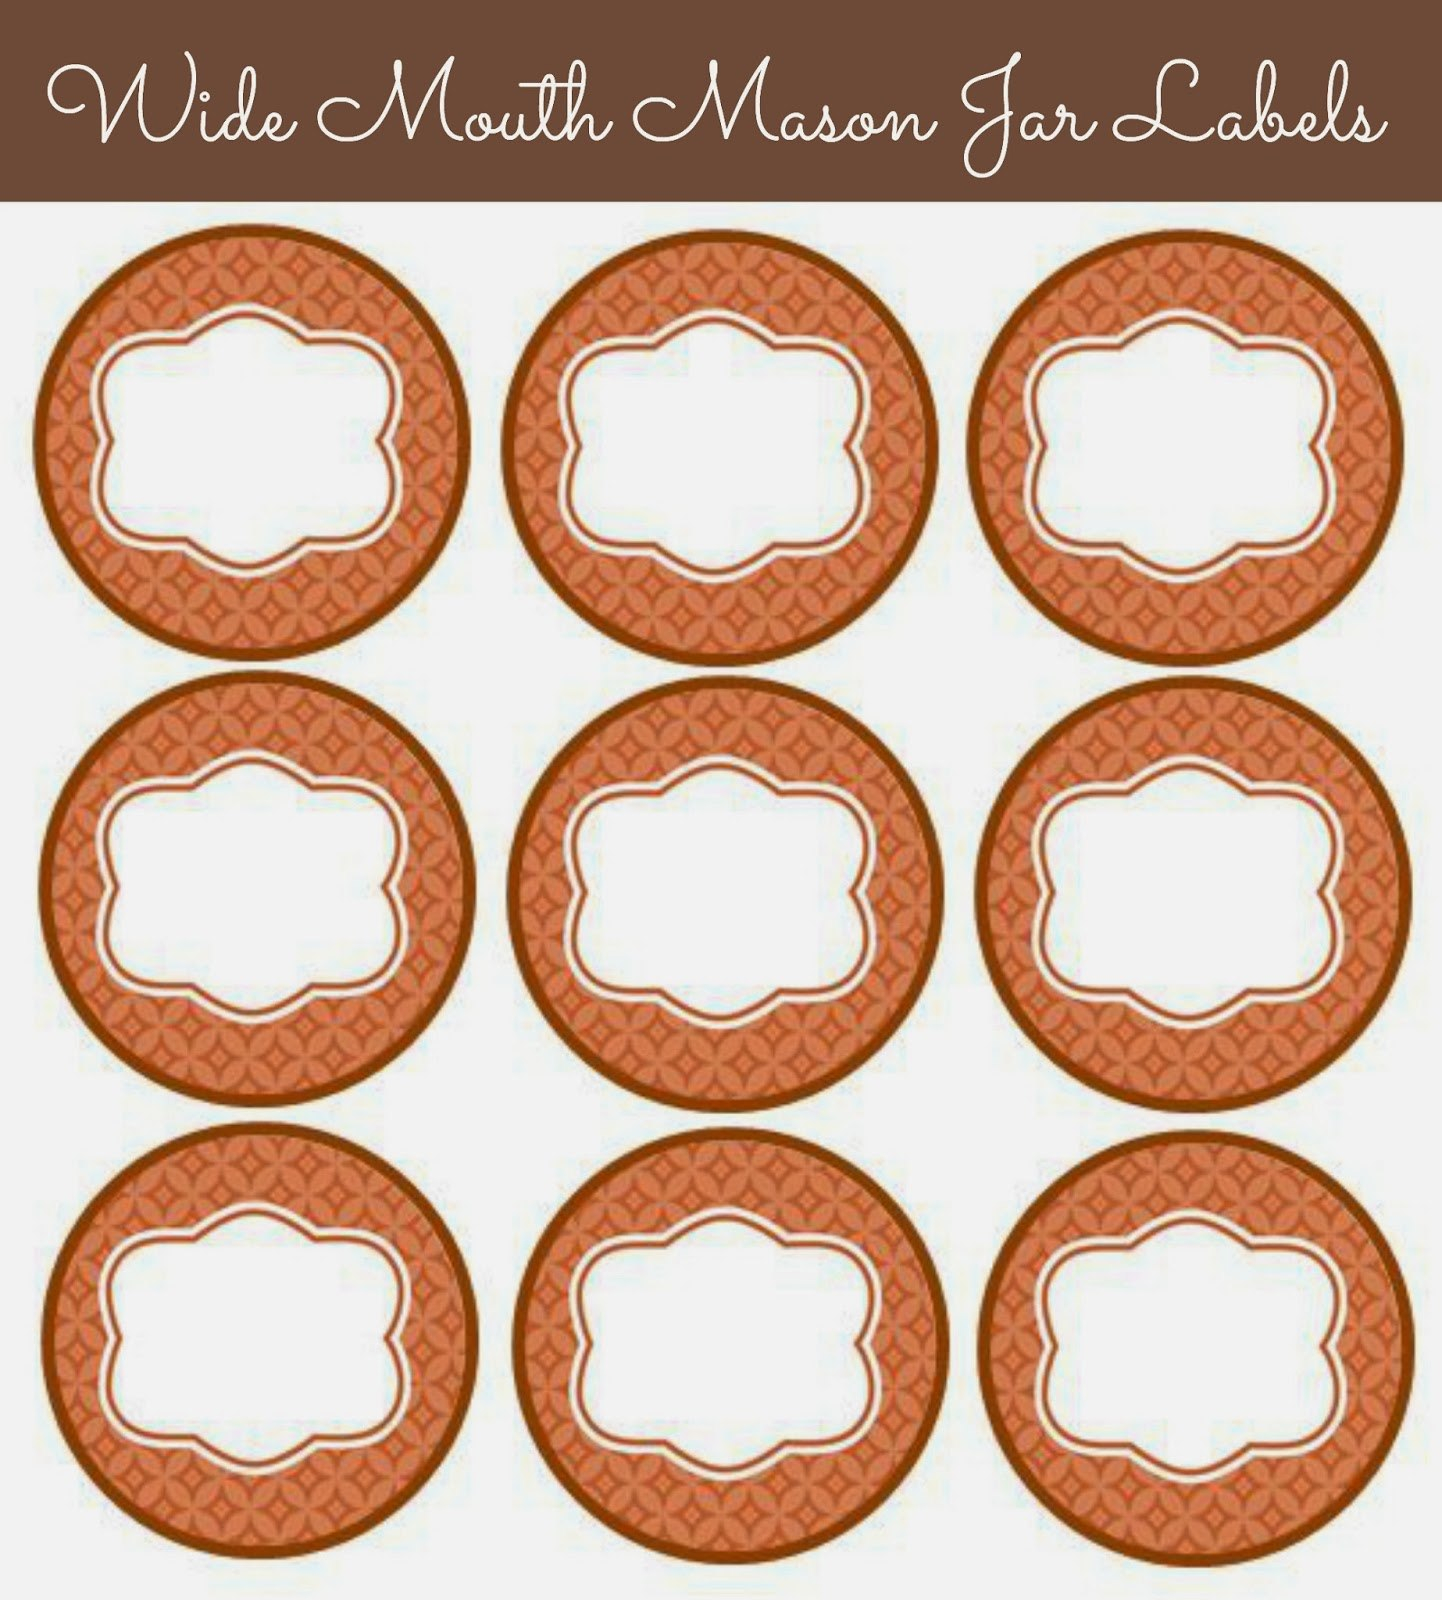 Cute Mason Jar Labels  Kittybabylove Regarding Canning Jar Labels Template